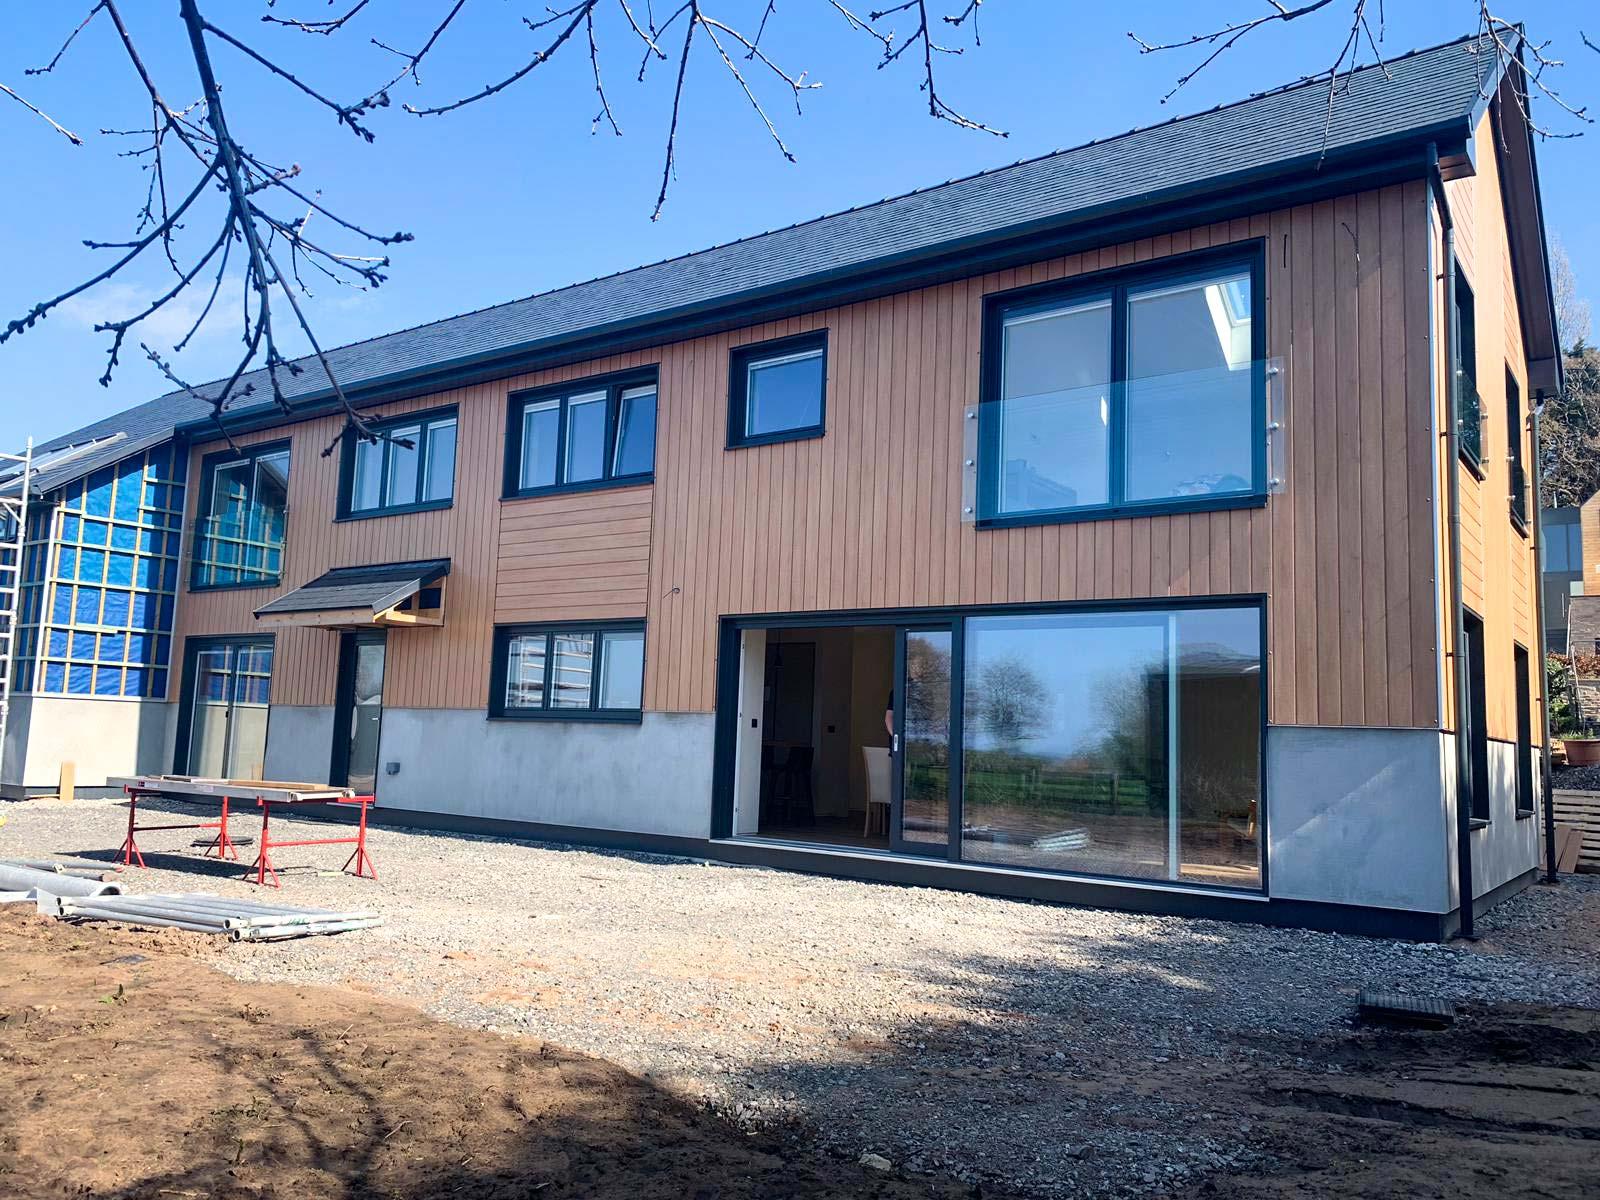 Brilliant Internorm Passivhaus Windows In A Self-Build